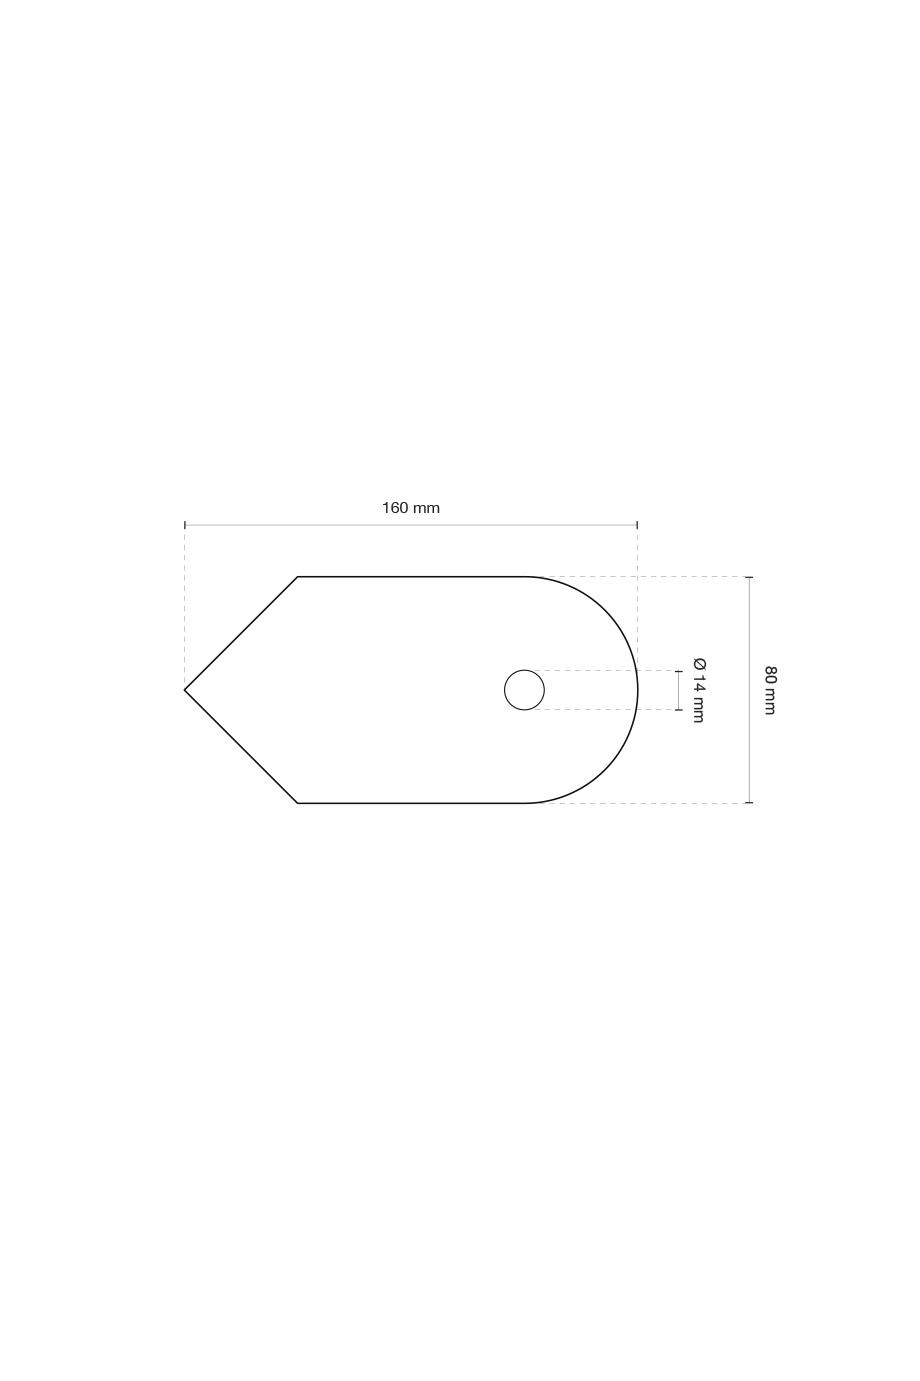 bitpart-dimensions-tag-backplate.jpg